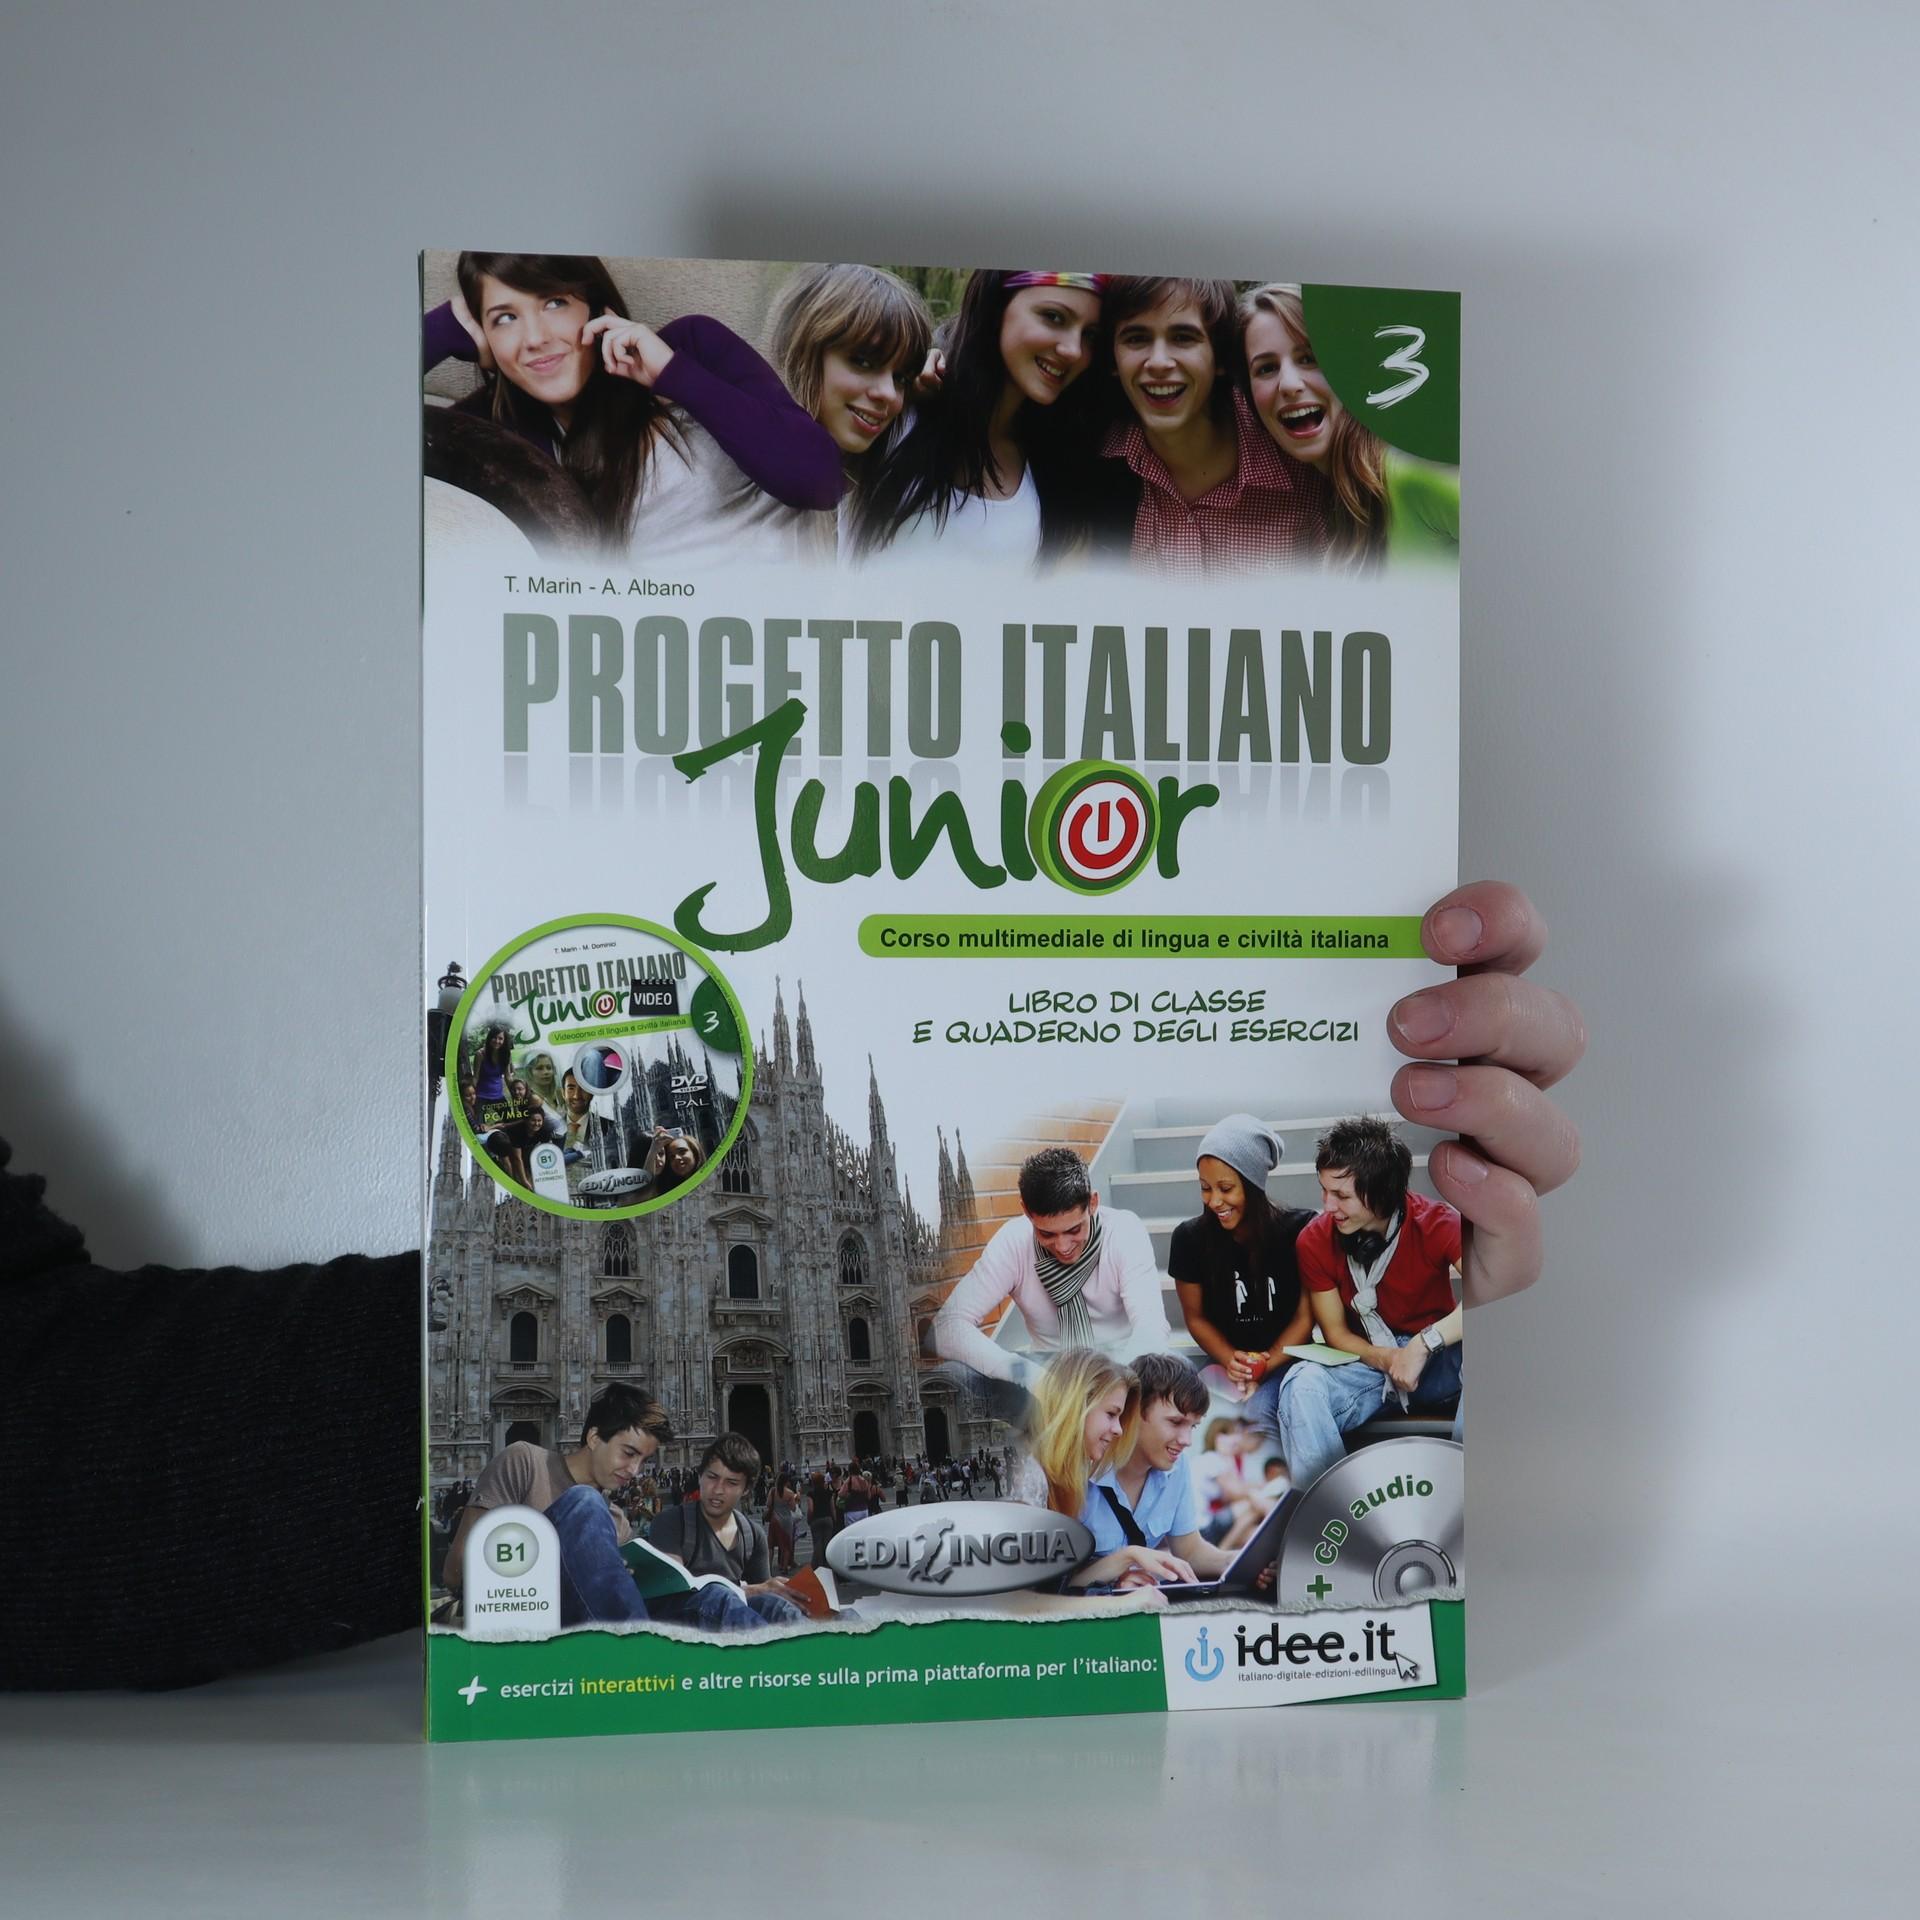 antikvární kniha Progetto Italiano Junior, 2012